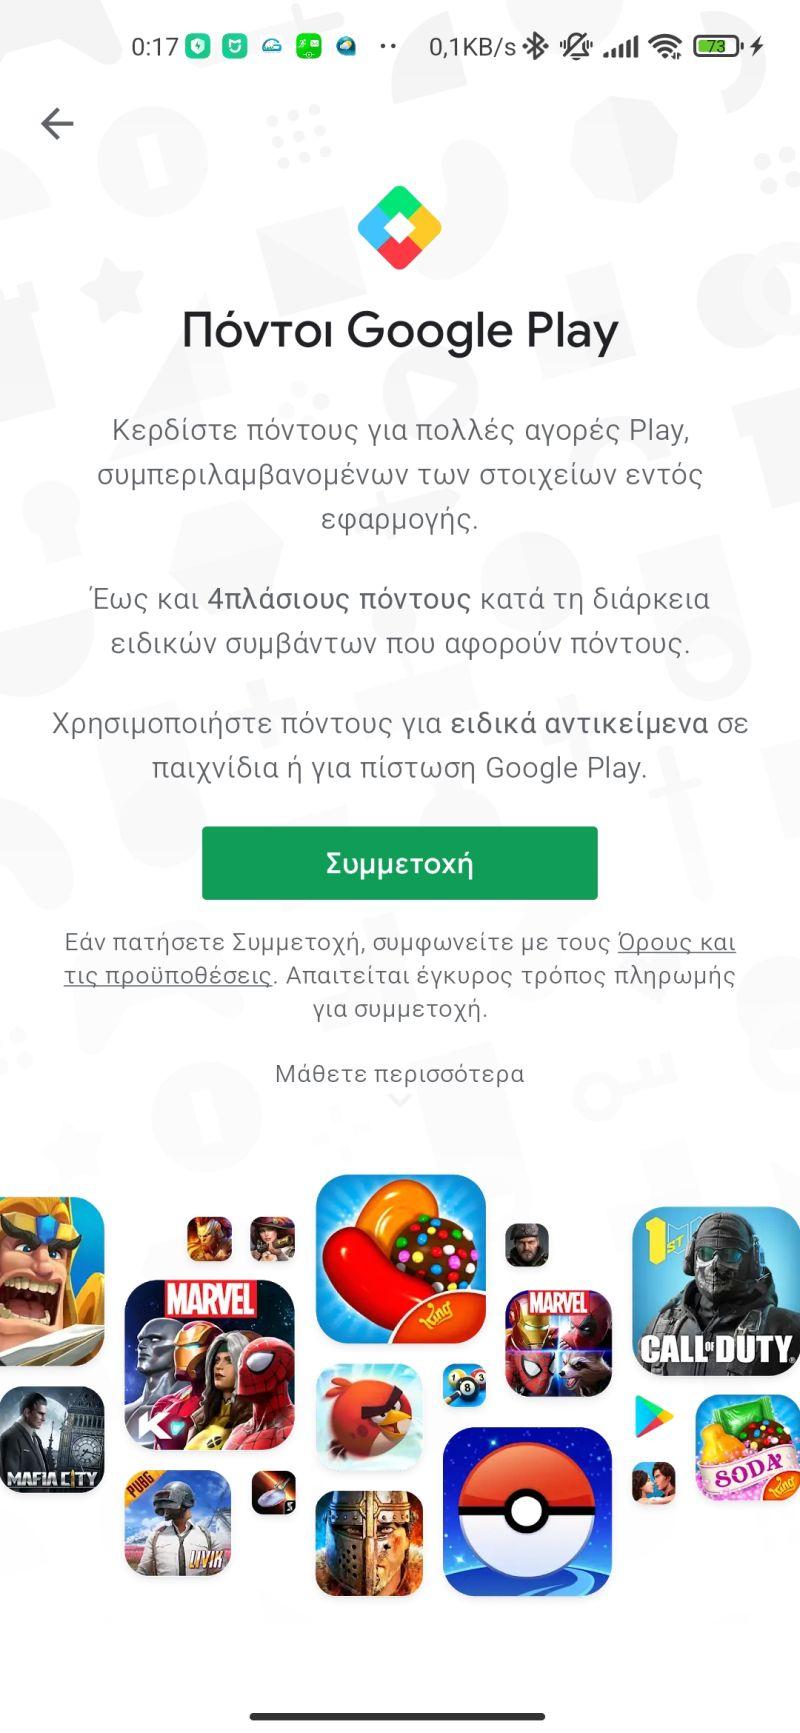 Google Play Points - Πως μπορείτε να εκμεταλευτείτε την νέα υπηρεσία της Google!